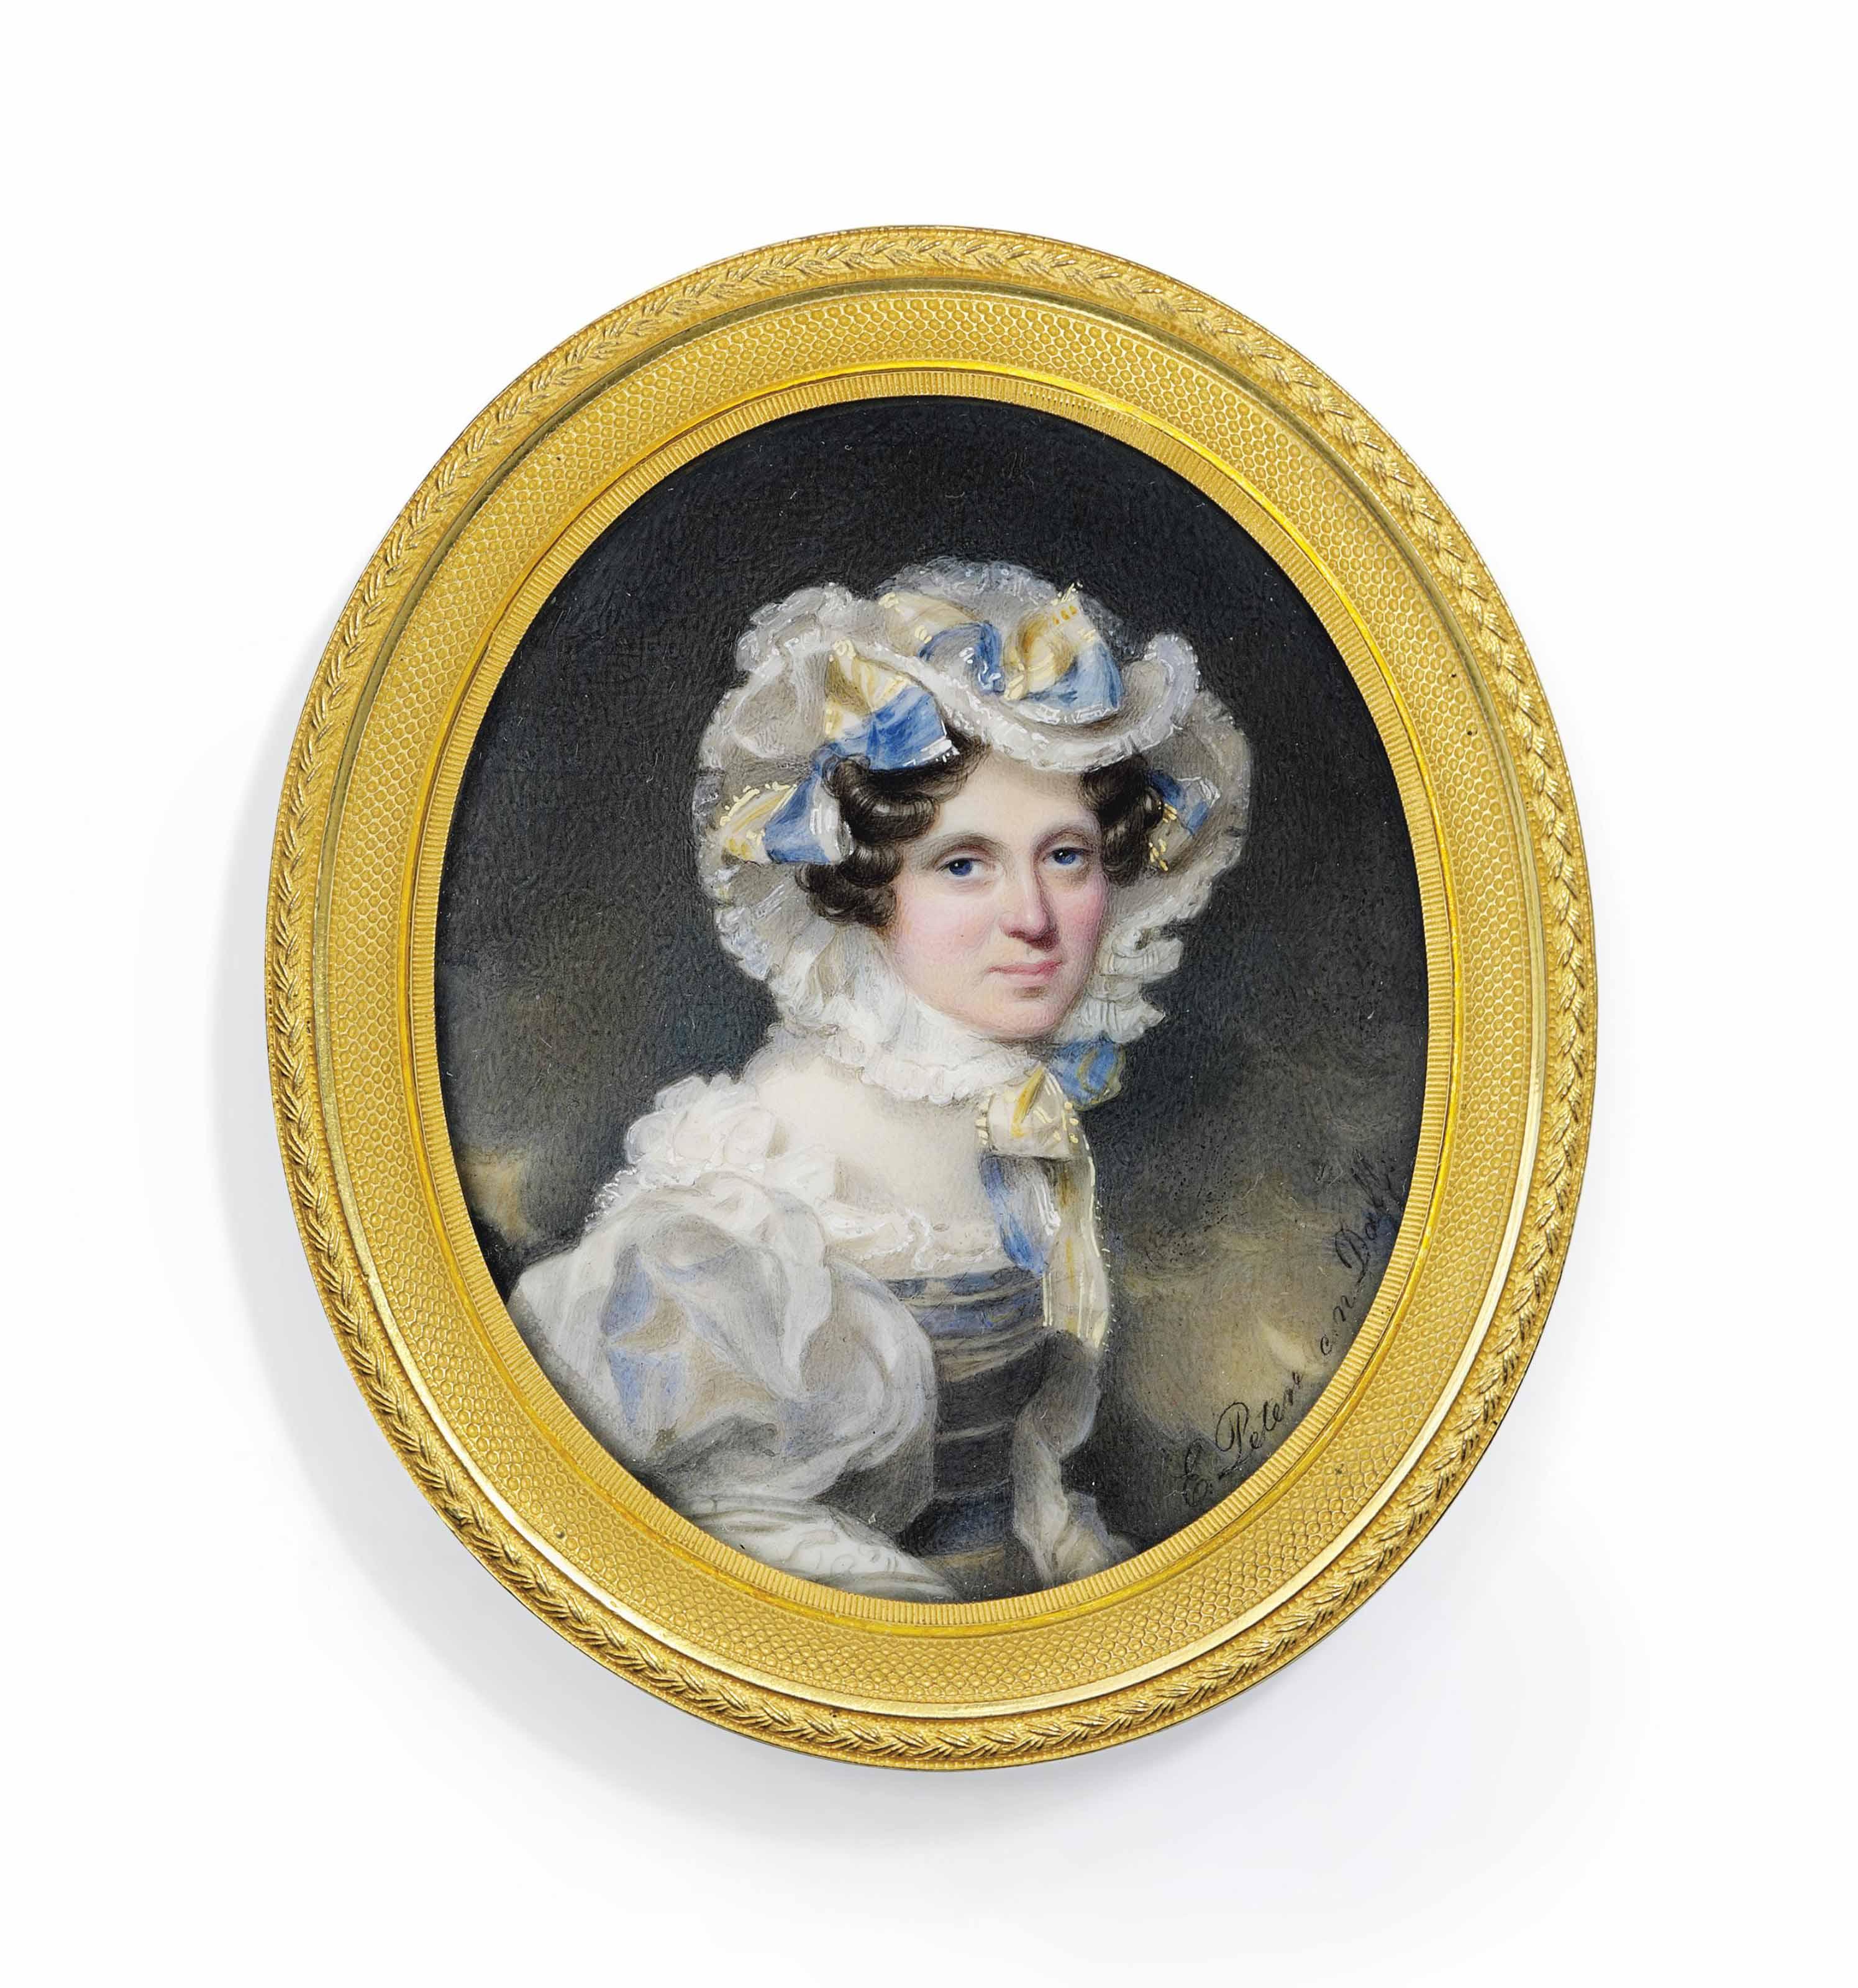 EMANUEL THOMAS PETER (AUSTRIAN, 1799-1873) AFTER MORITZ MICHAEL DAFFINGER (AUSTRIAN, 1790-1849)